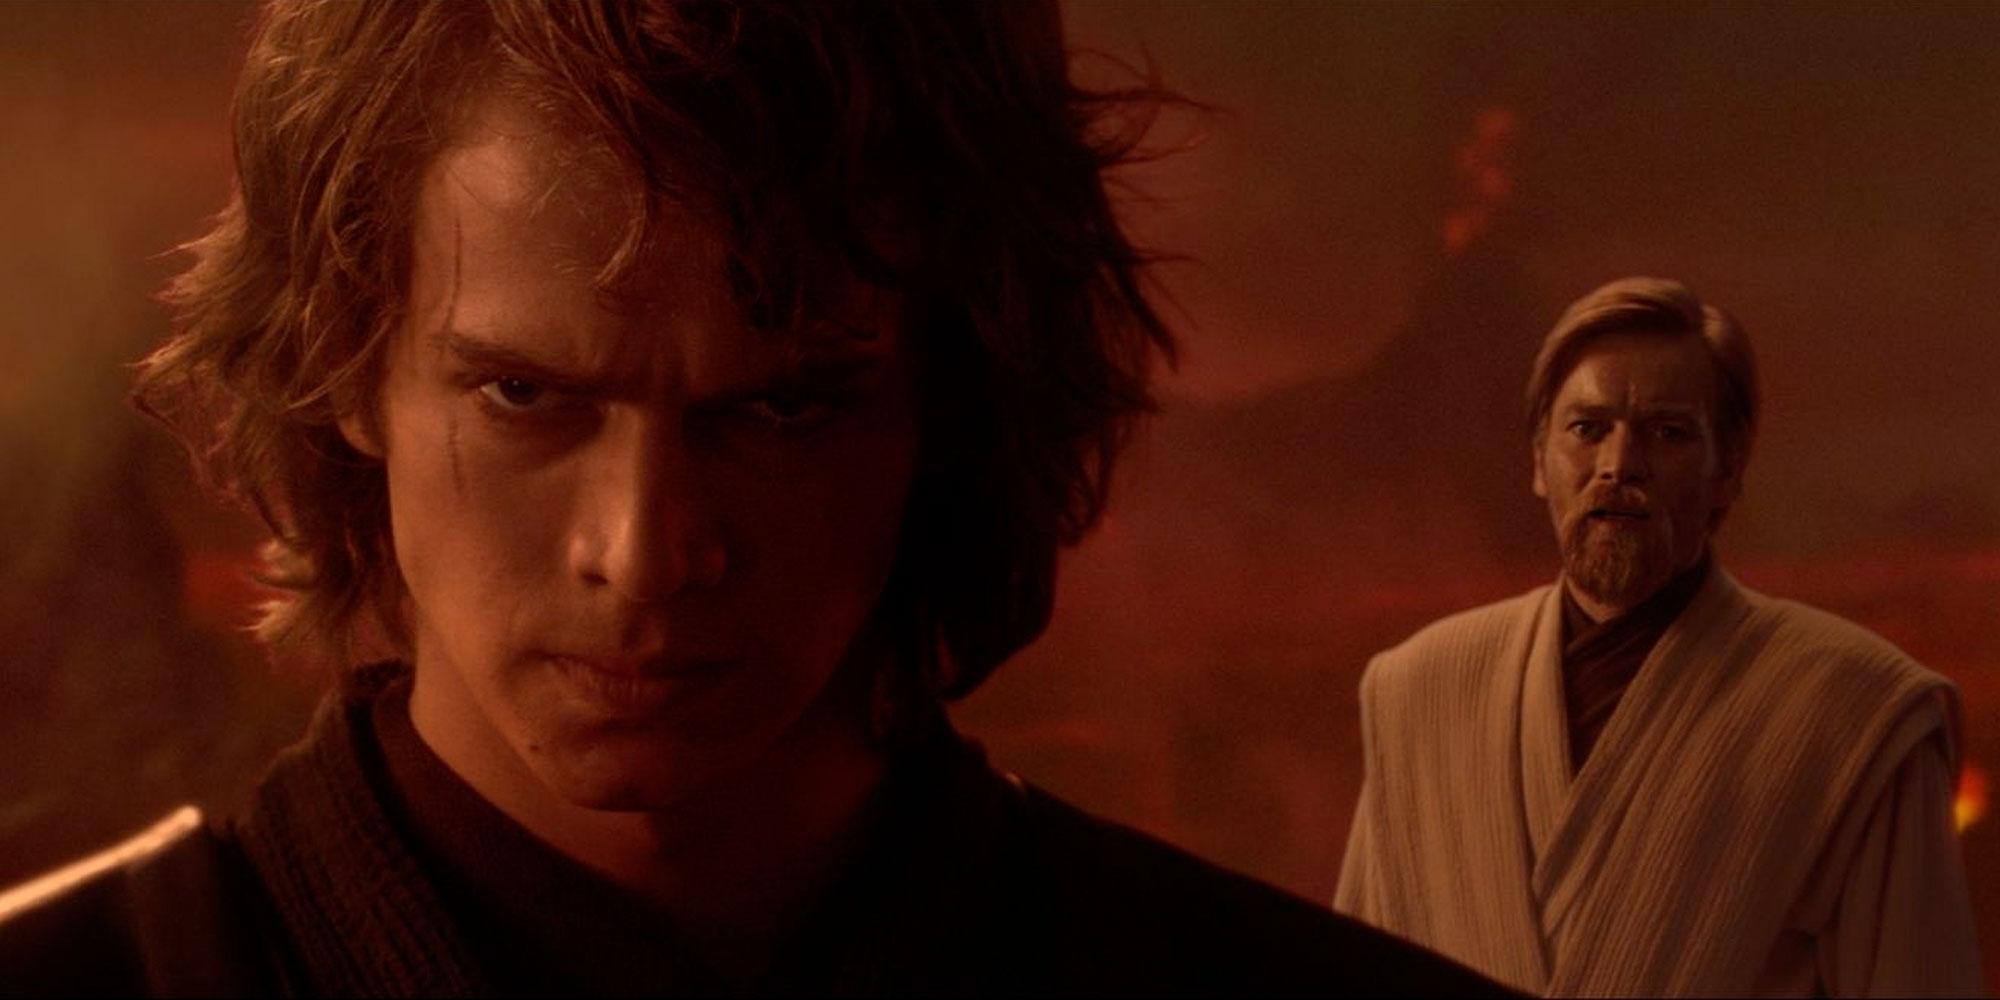 Memorial Day Blu-rays from $9: Star Wars Sagas, X-Men Trilogies, Creed II, more